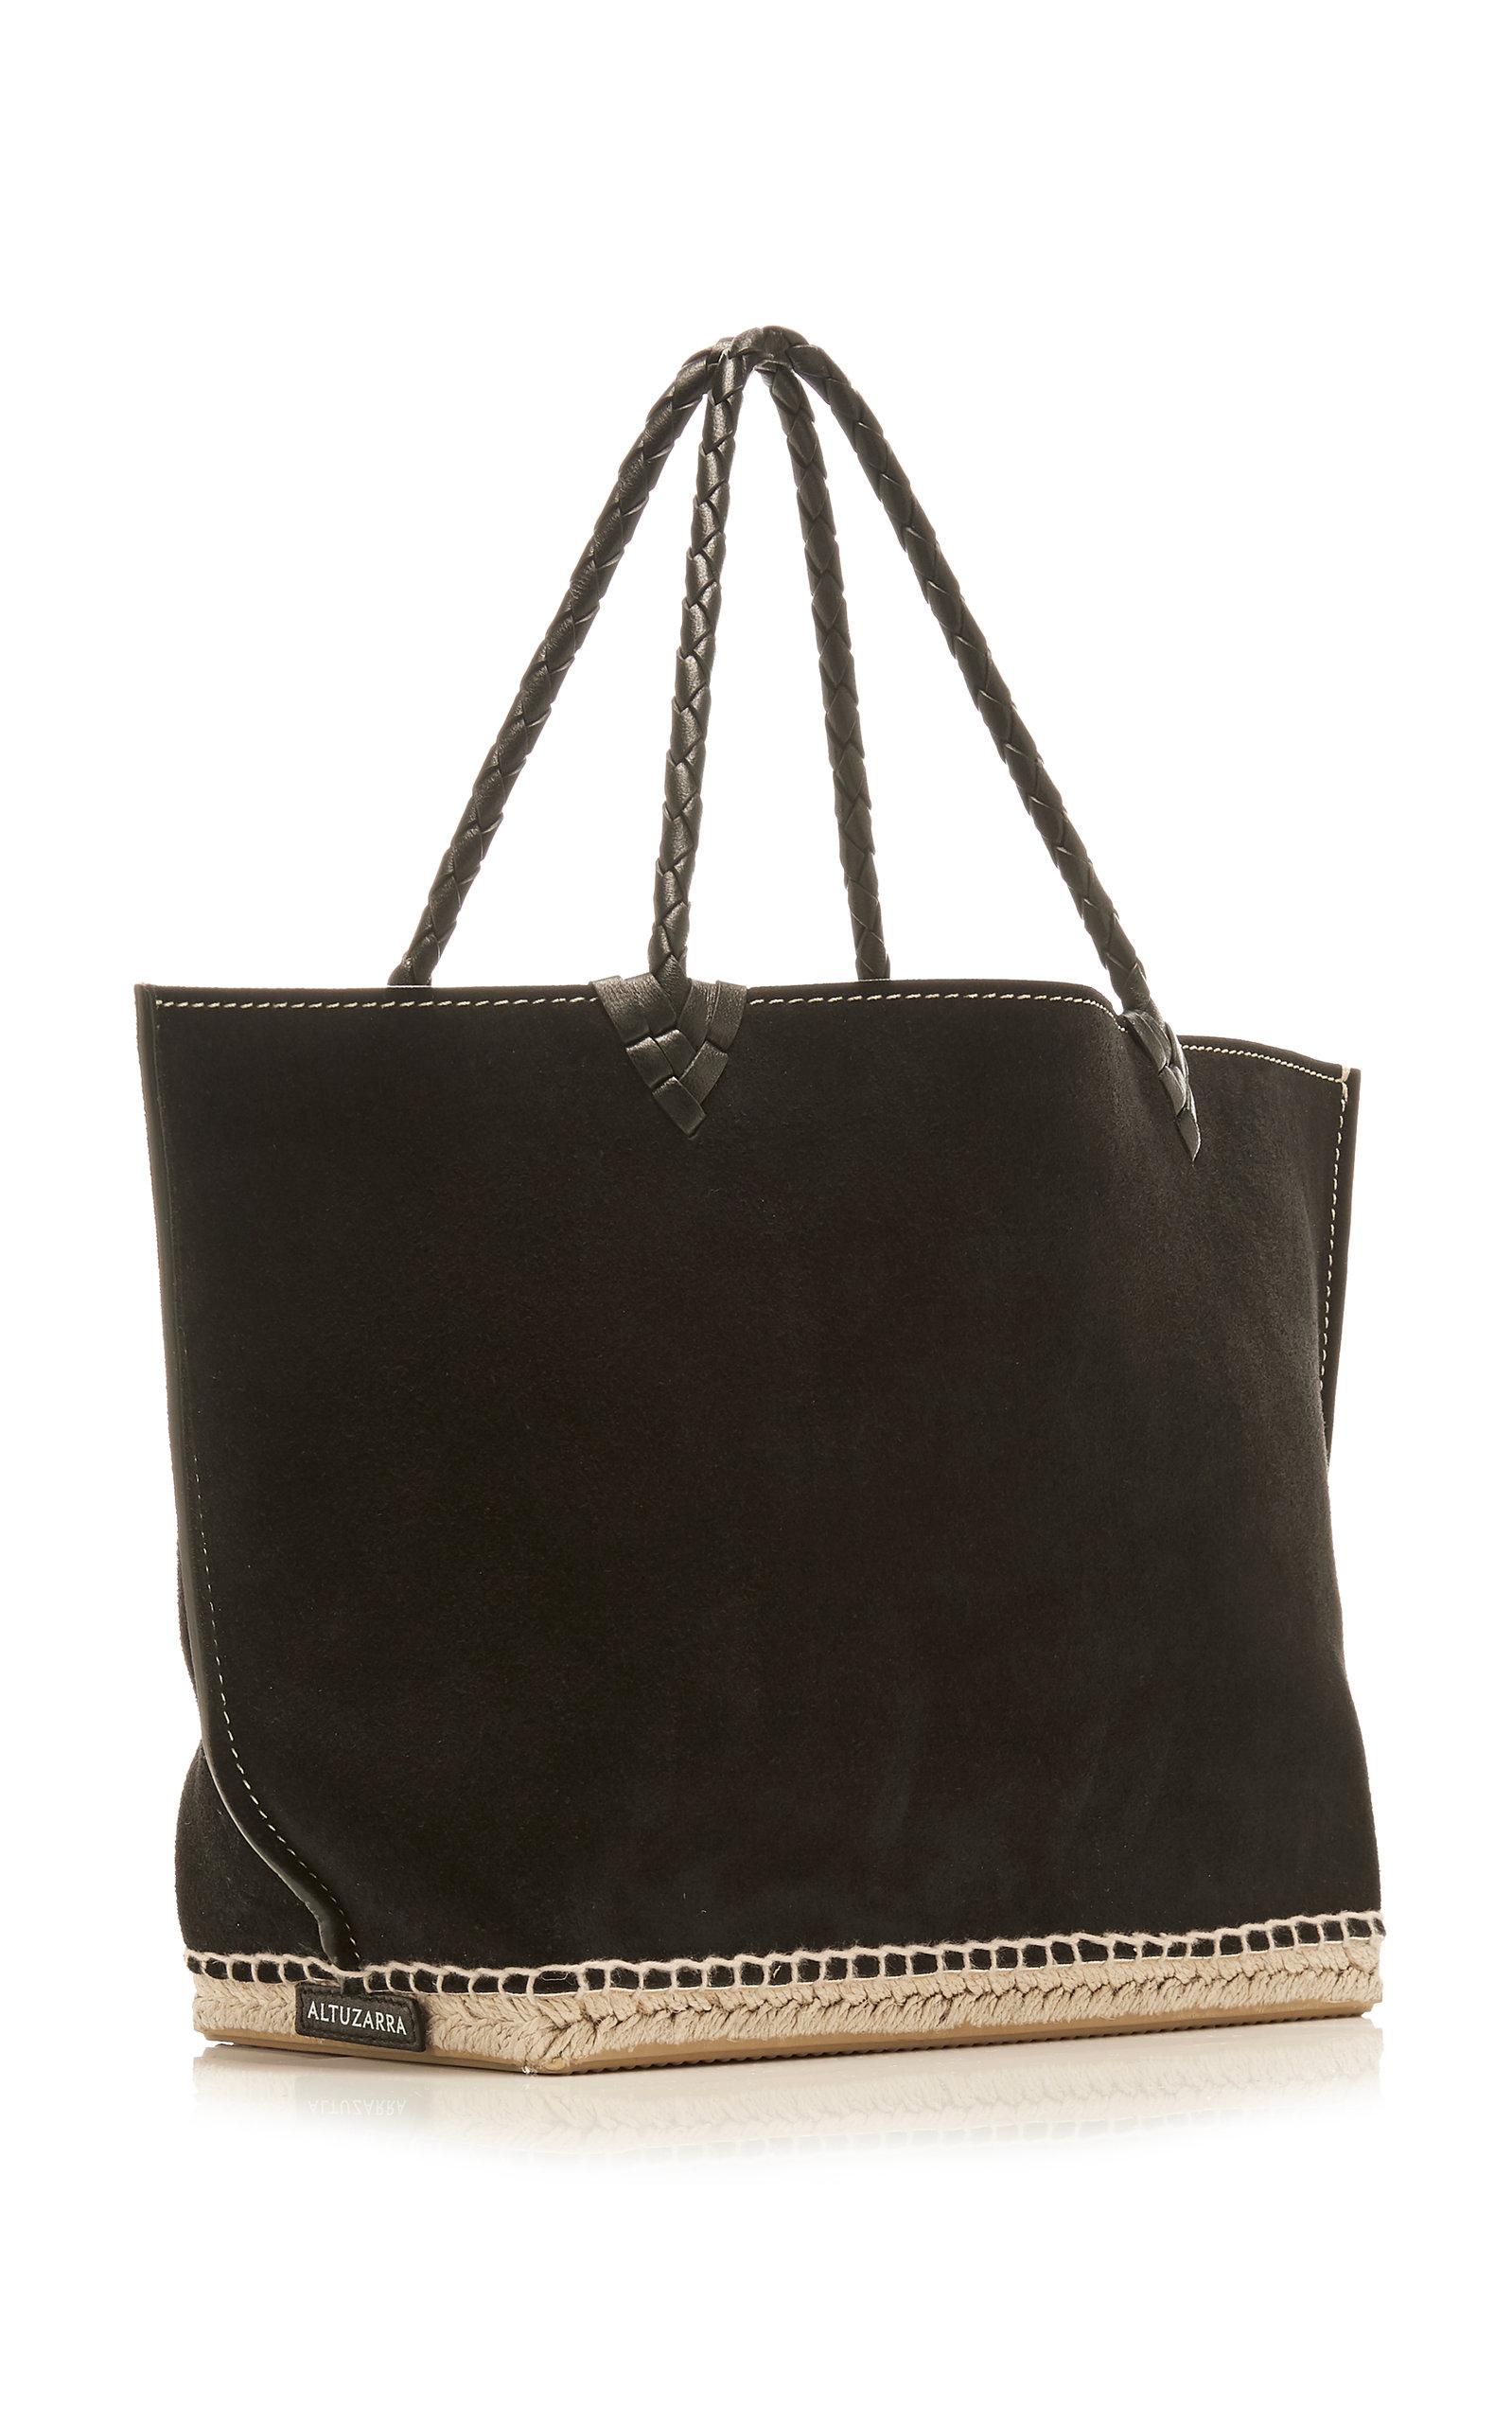 60ebb3efacfd Women's Bags | Moda Operandi | Moda Operandi